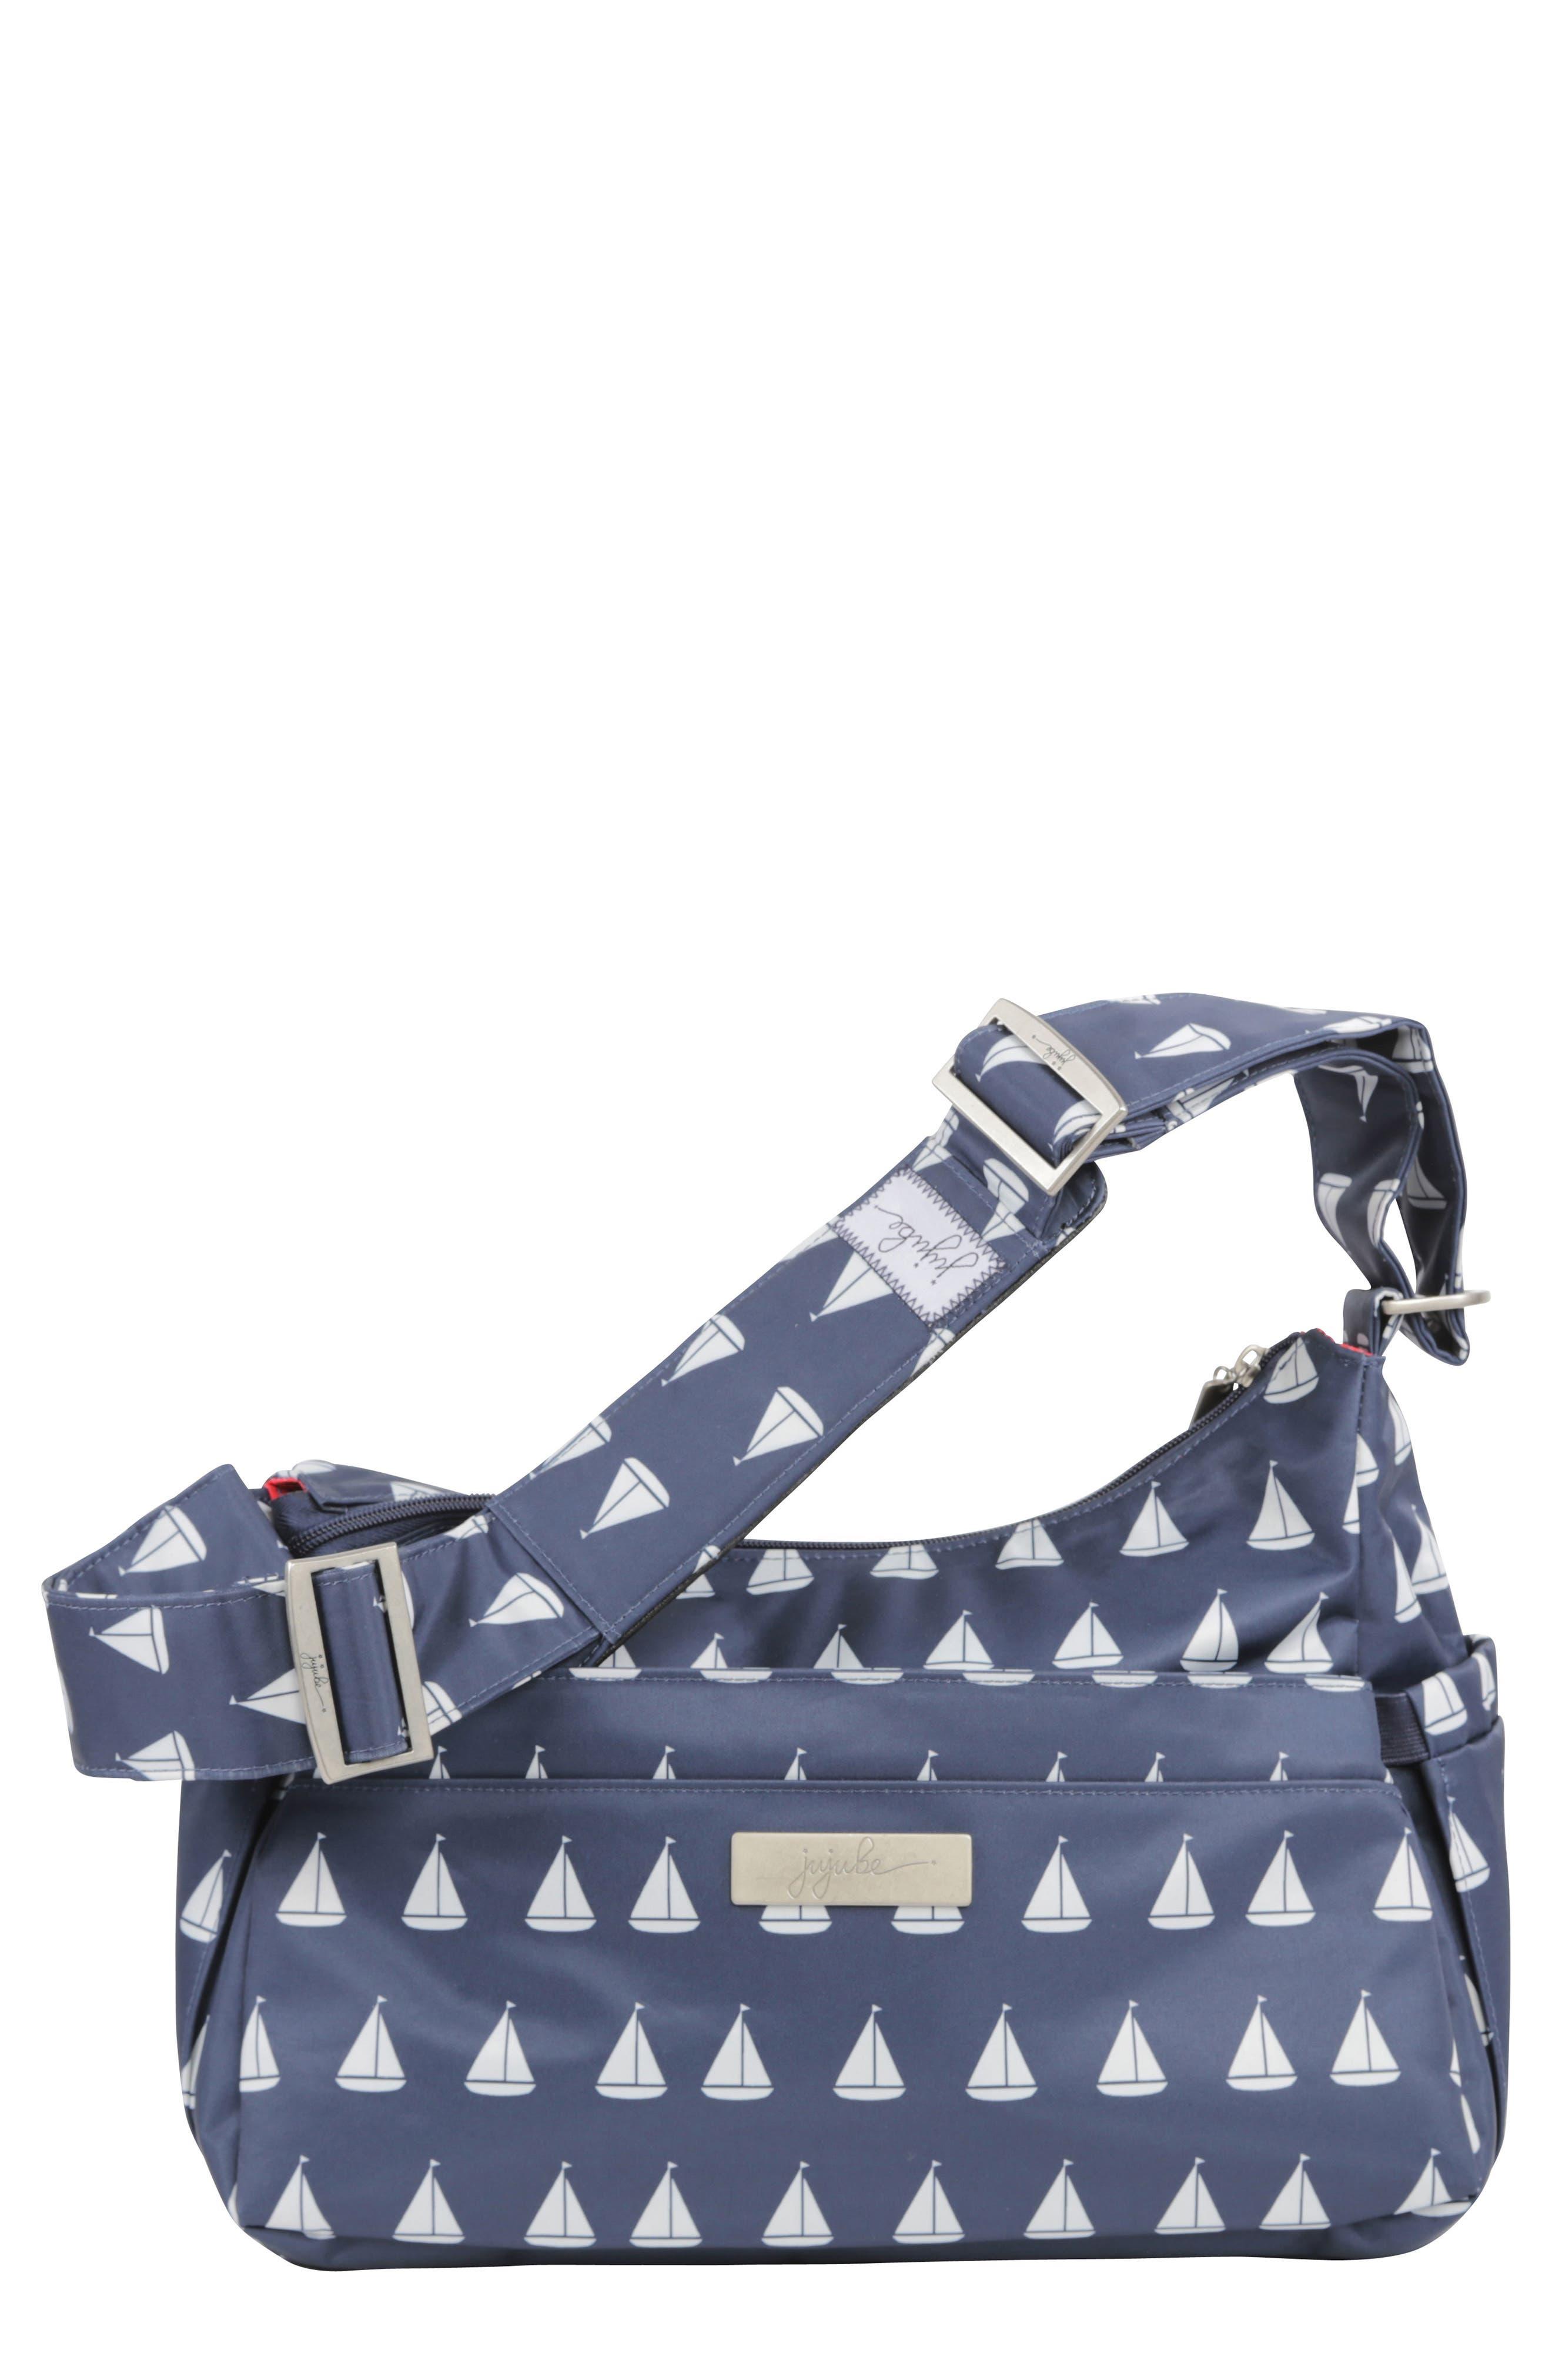 Ju-Ju-Be HoboBe - Coastal Collection Diaper Bag